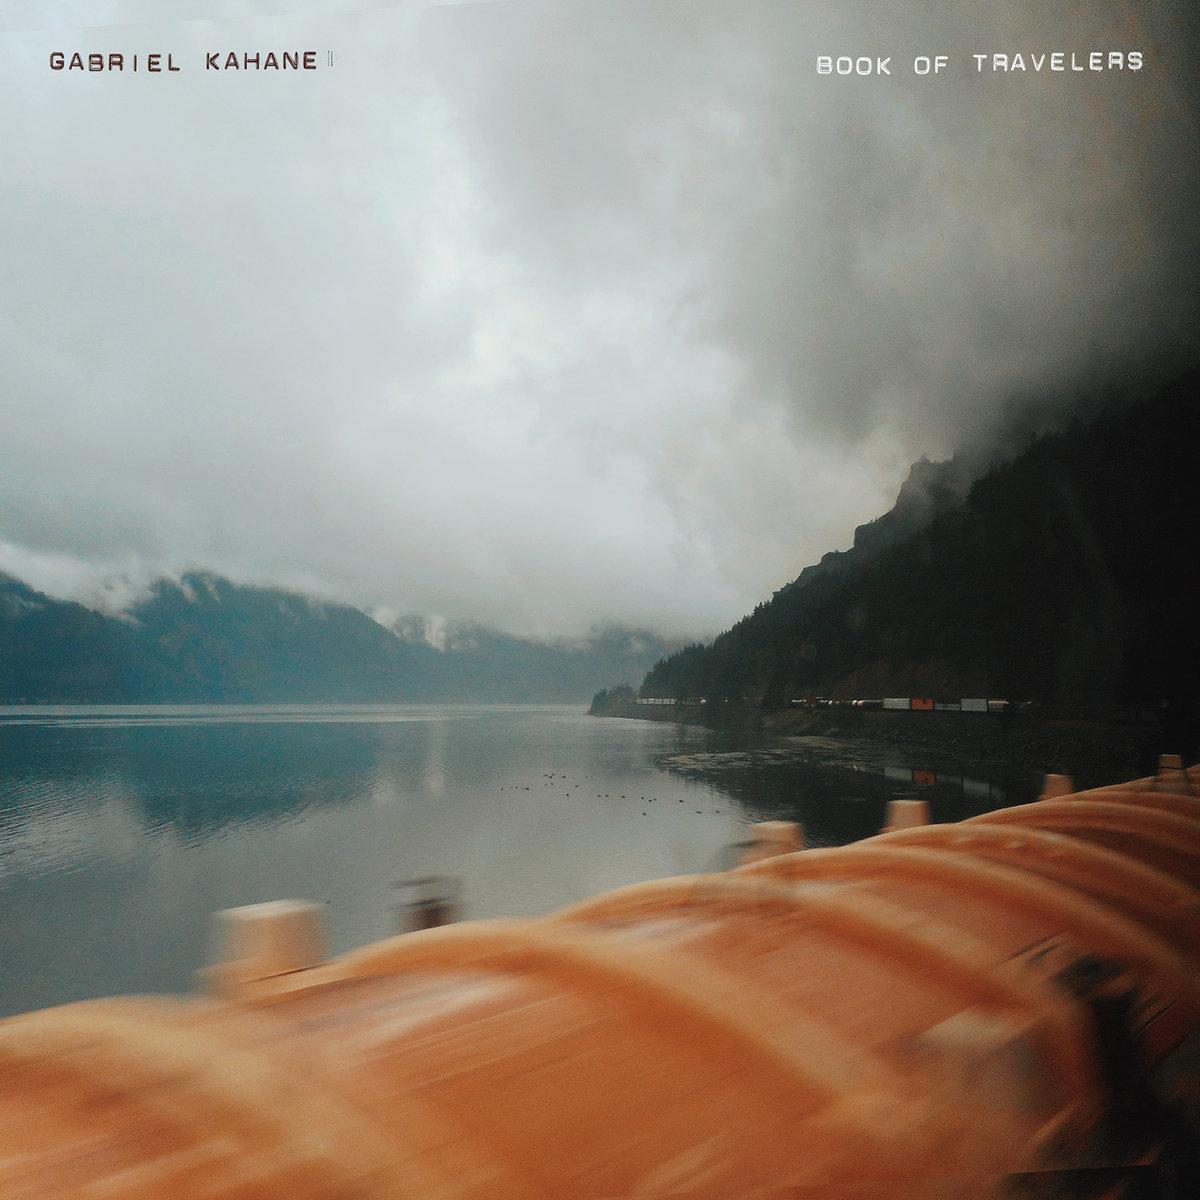 Gabriel Kahane - Book of Travelers